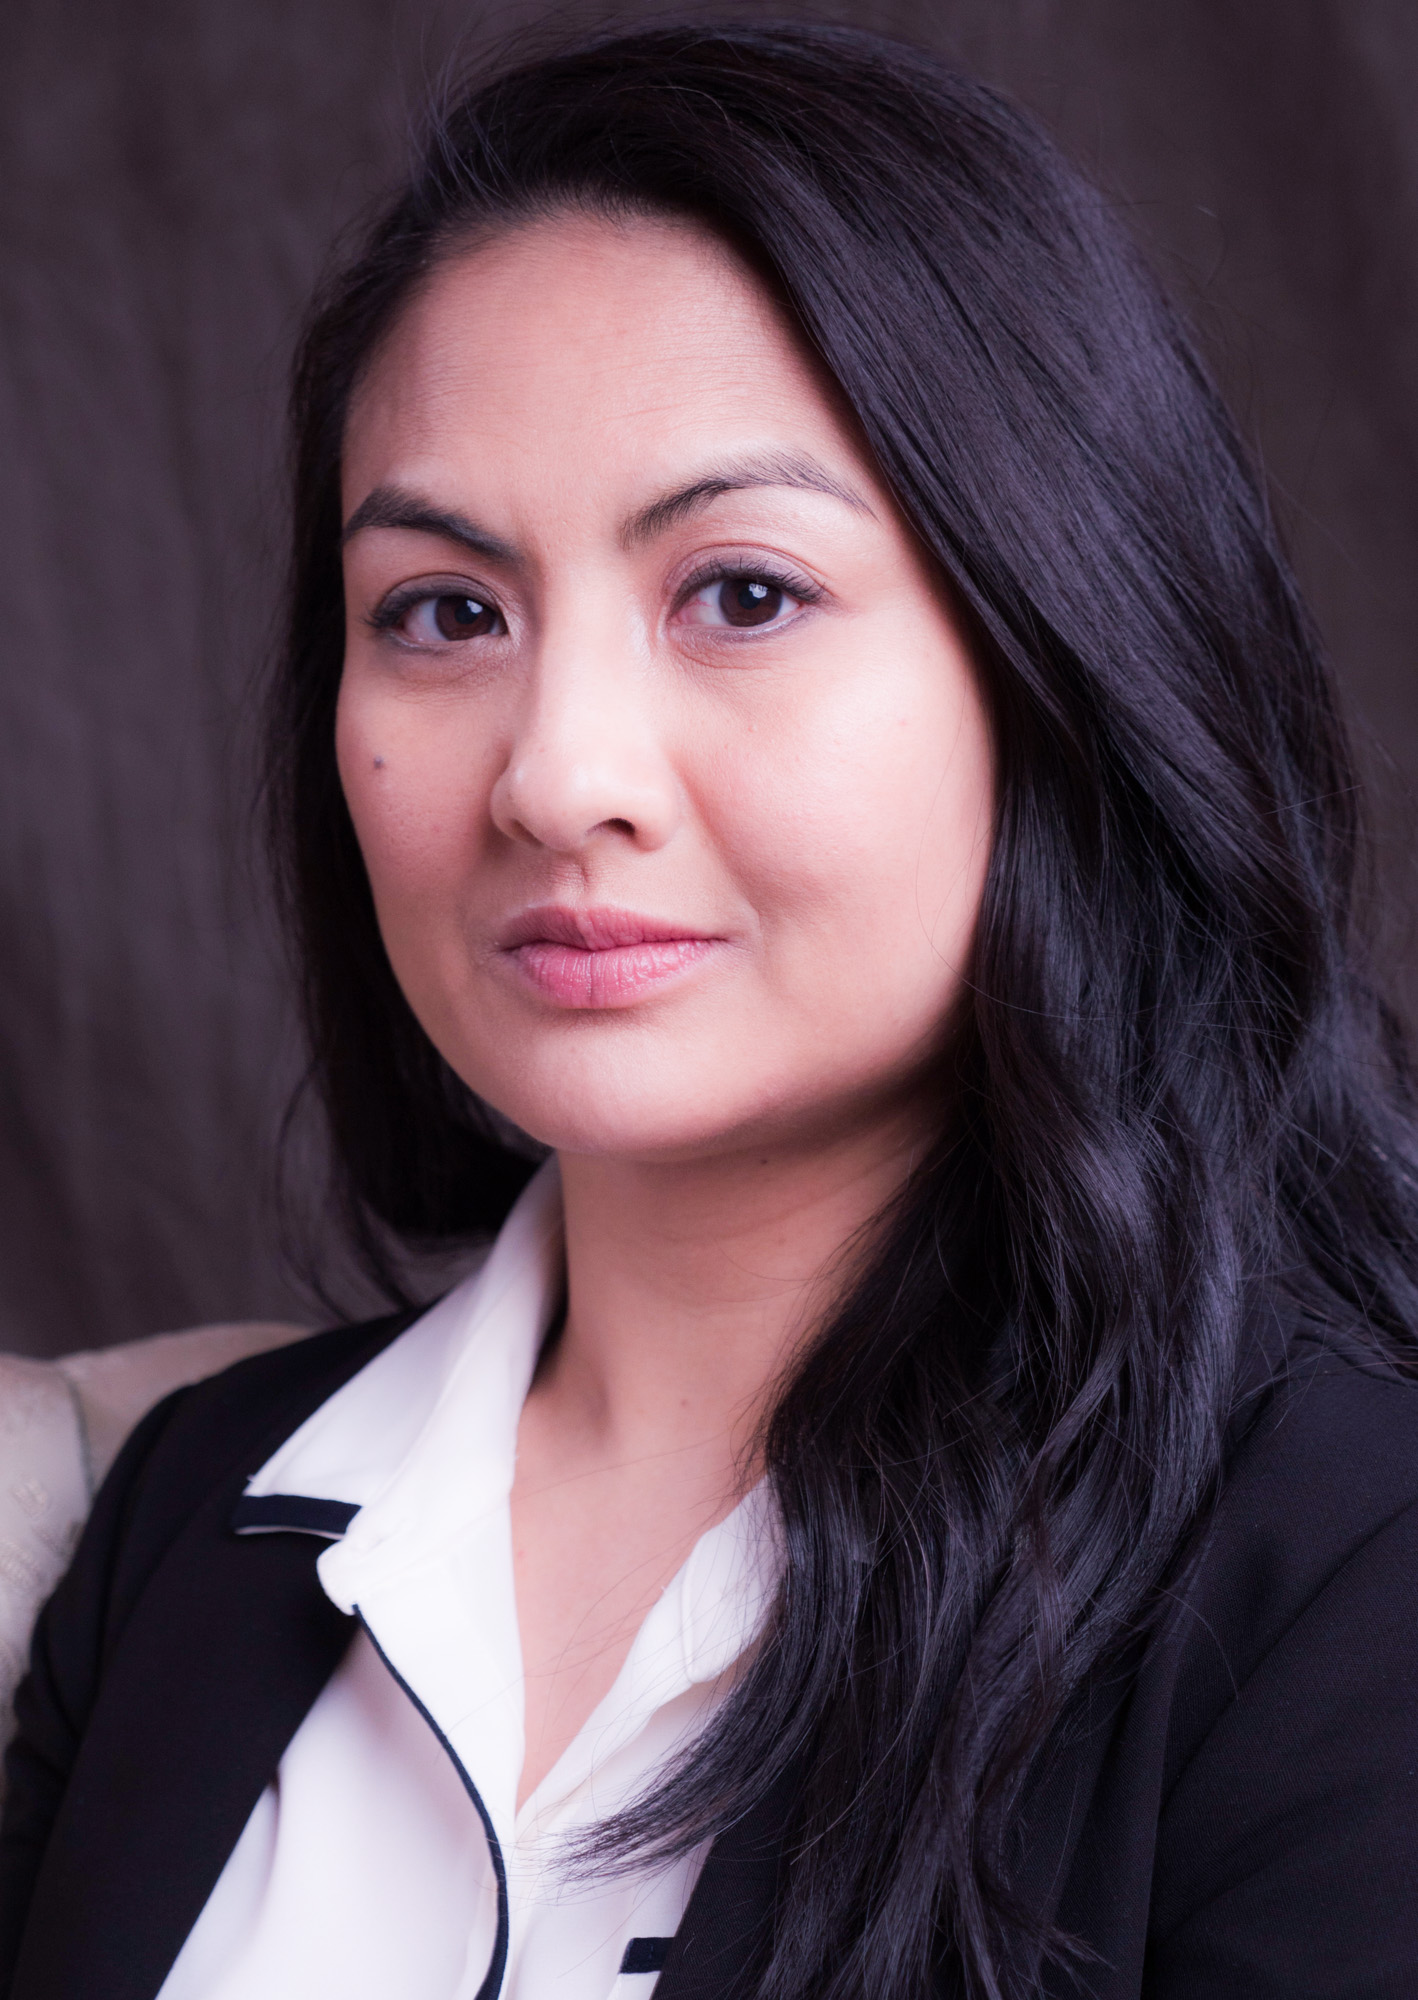 Discussion on this topic: Nina Arianda, ella-purnell/